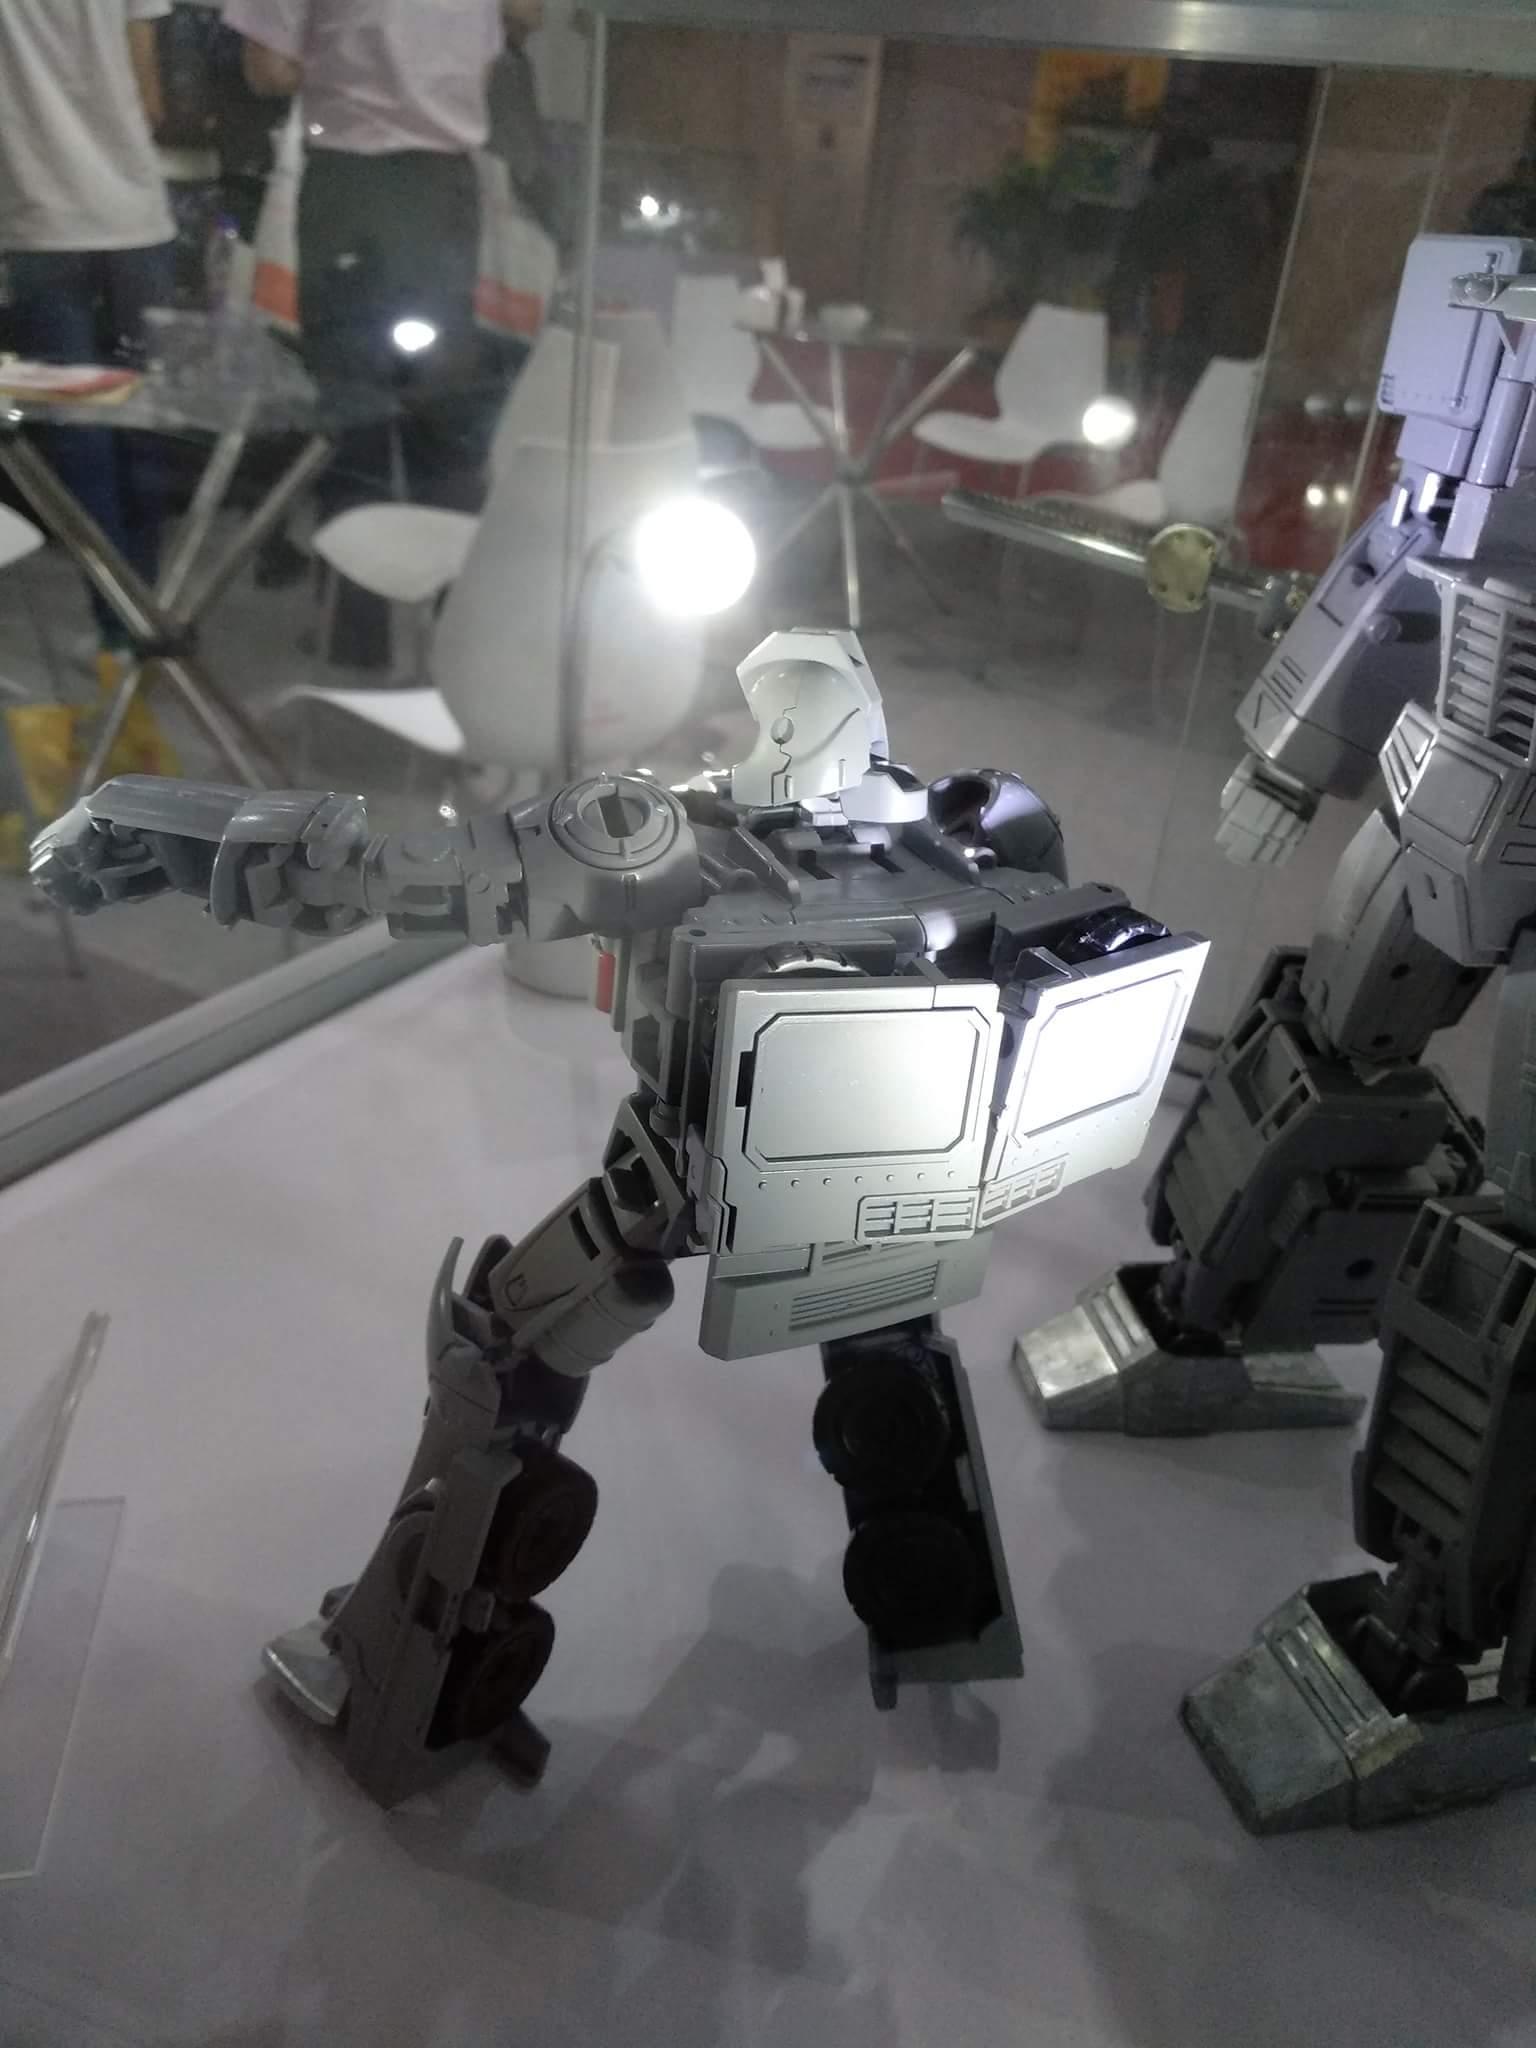 Masterpiece G1 - KO/Bootleg/Knockoff Transformers - Nouveautés, Questions, Réponses - Page 15 JPIJK6pm_o